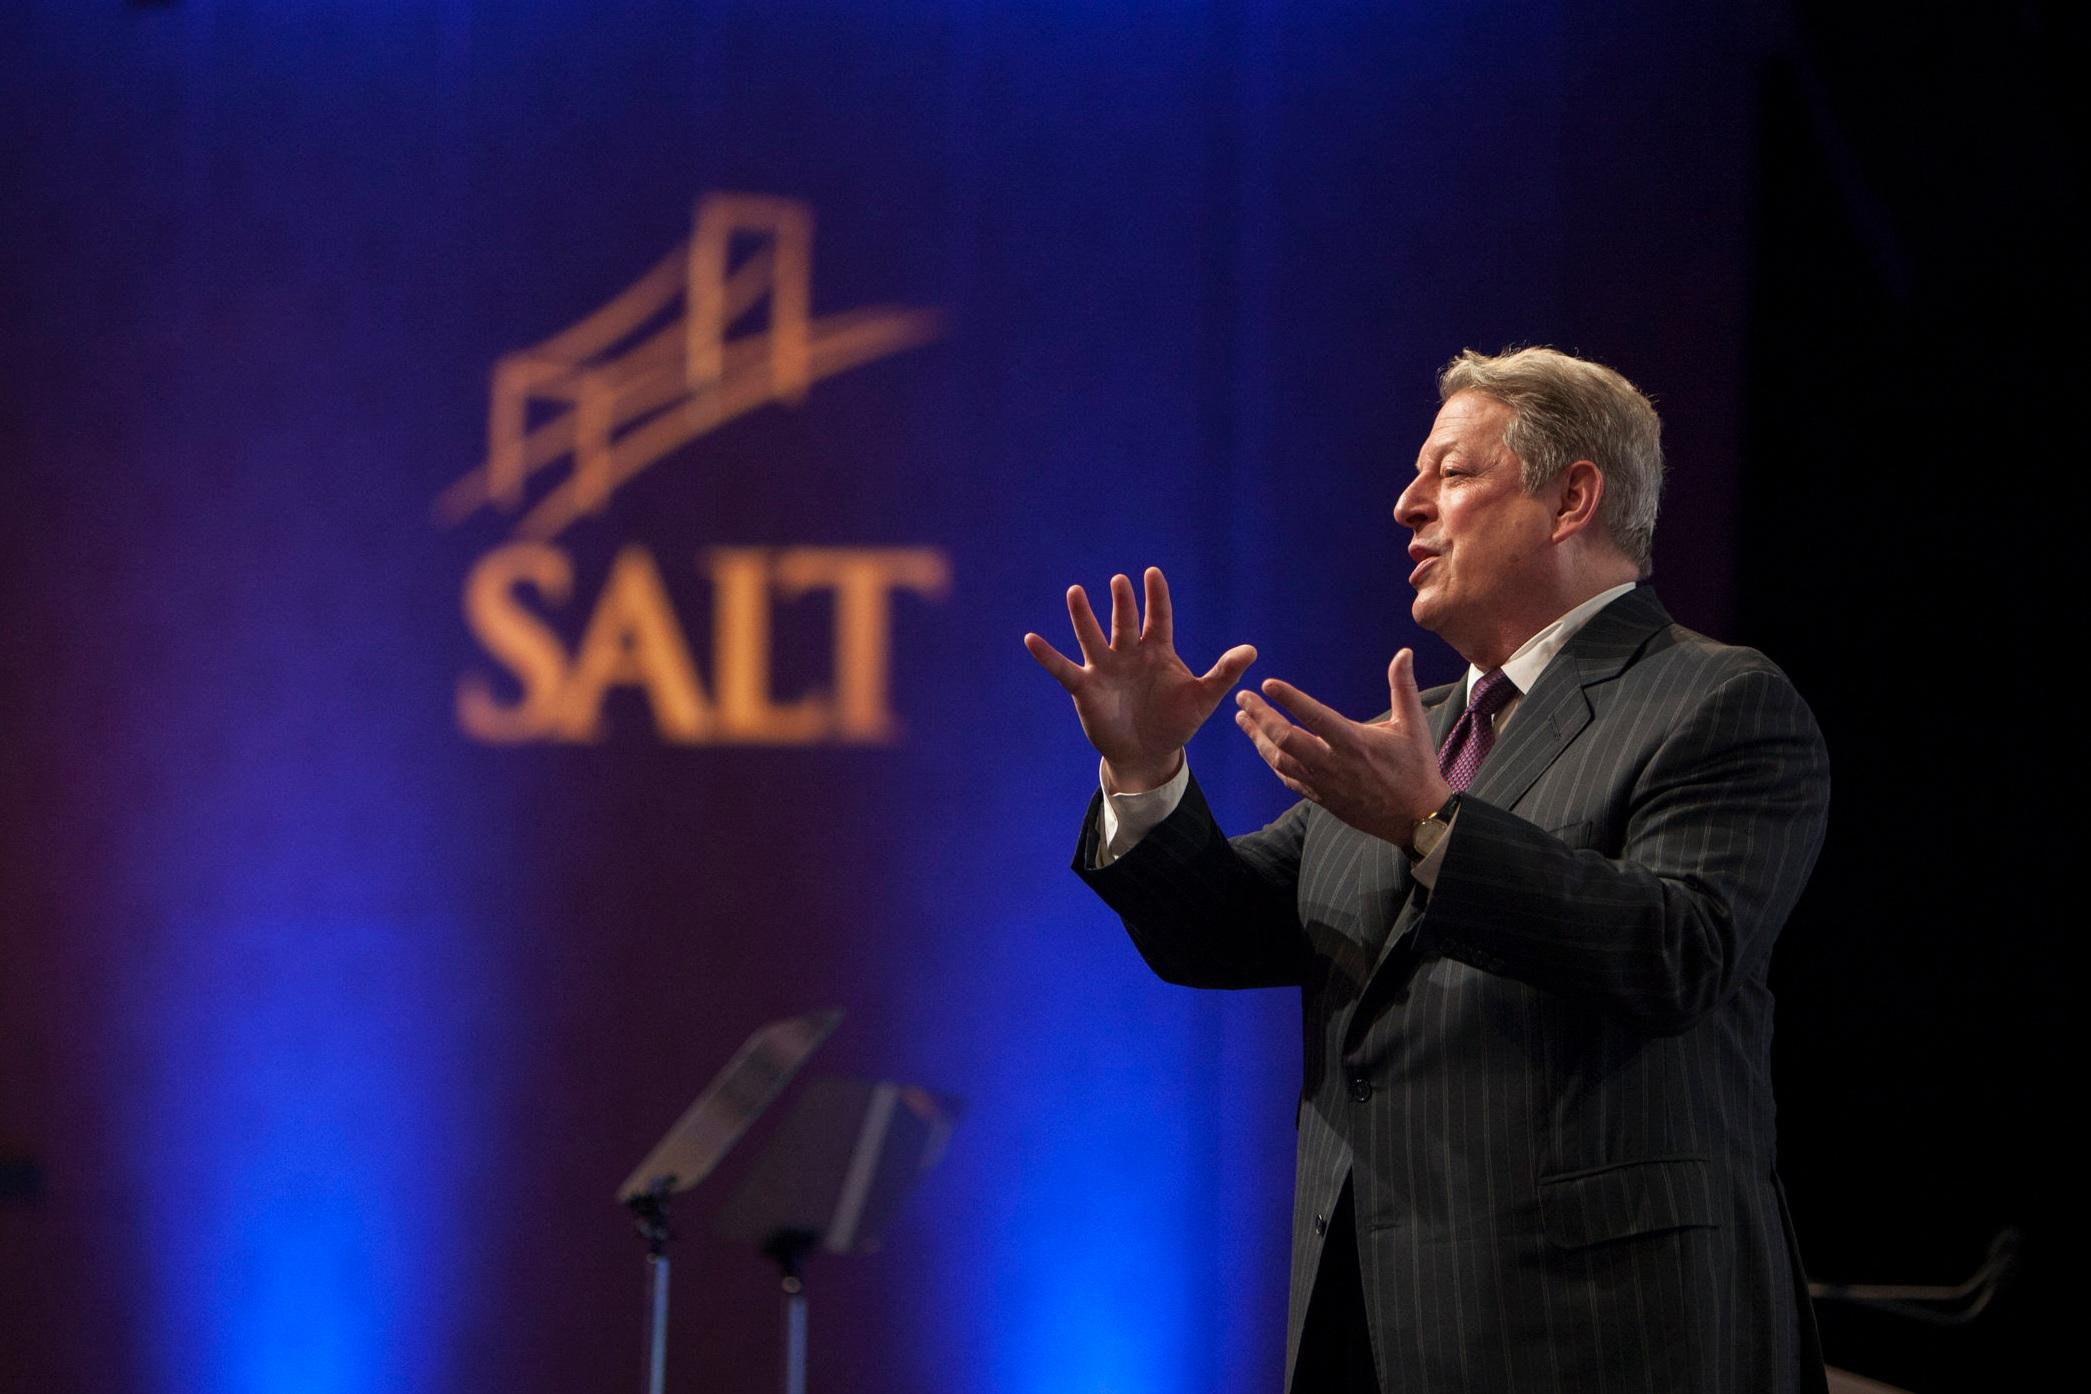 SALT 2012 - 45th Vice President of the United States & Nobel Laureate AL GORE